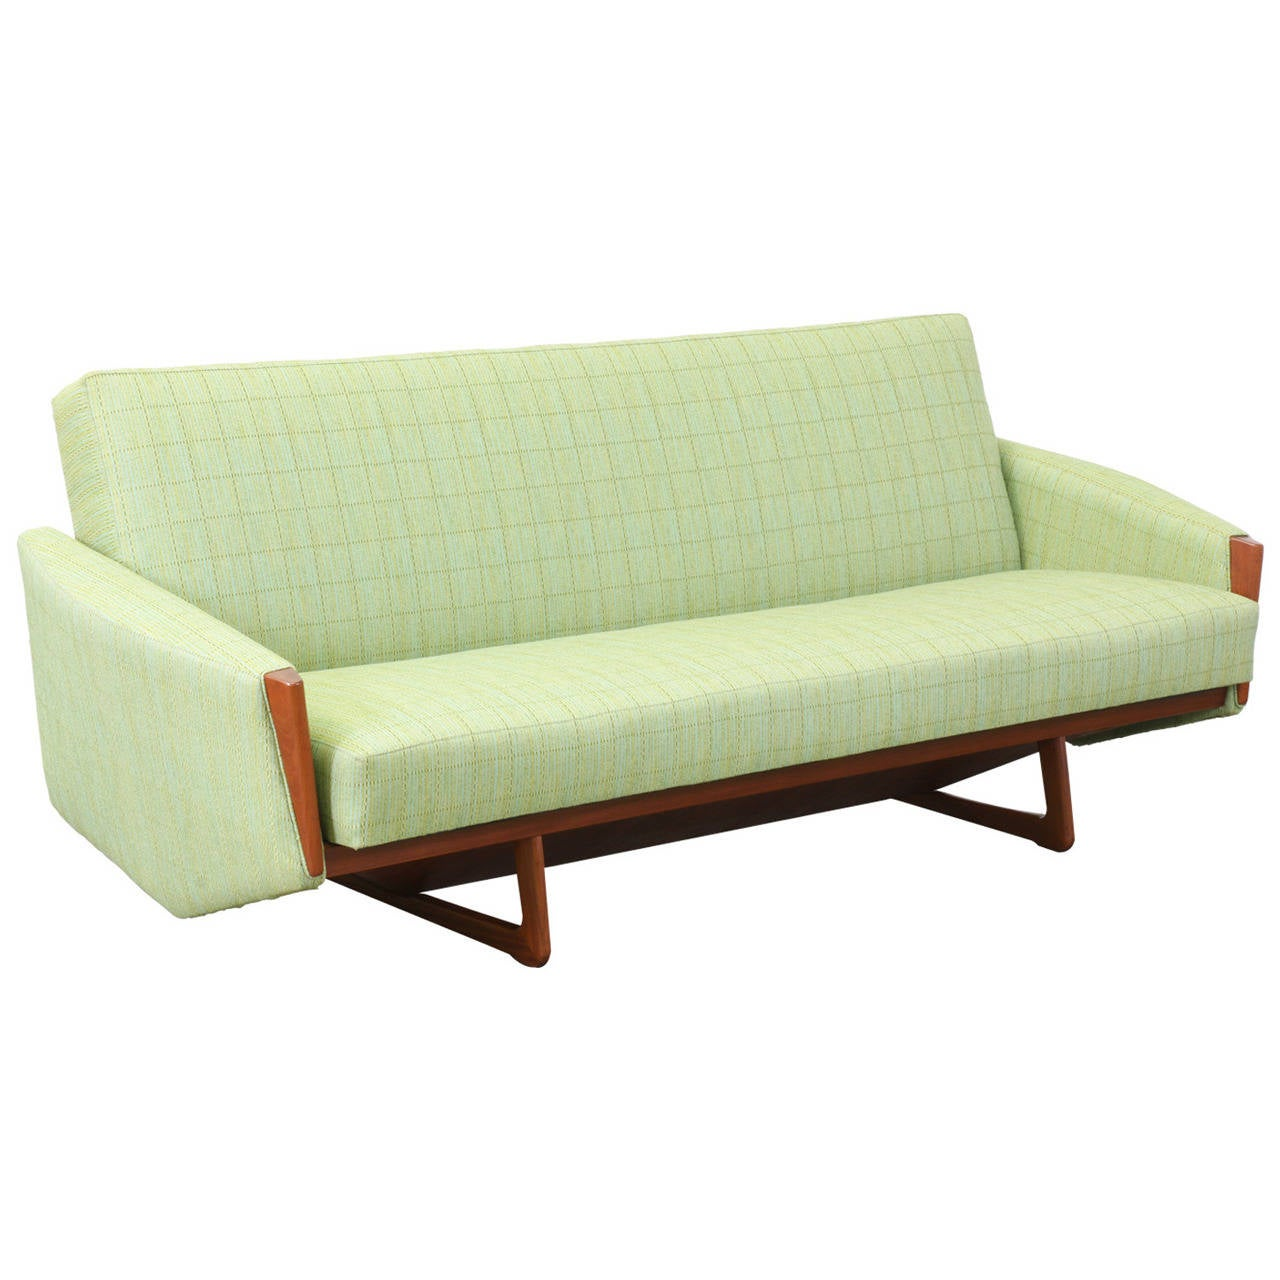 danish modern sofa bed leather donation value teak at 1stdibs